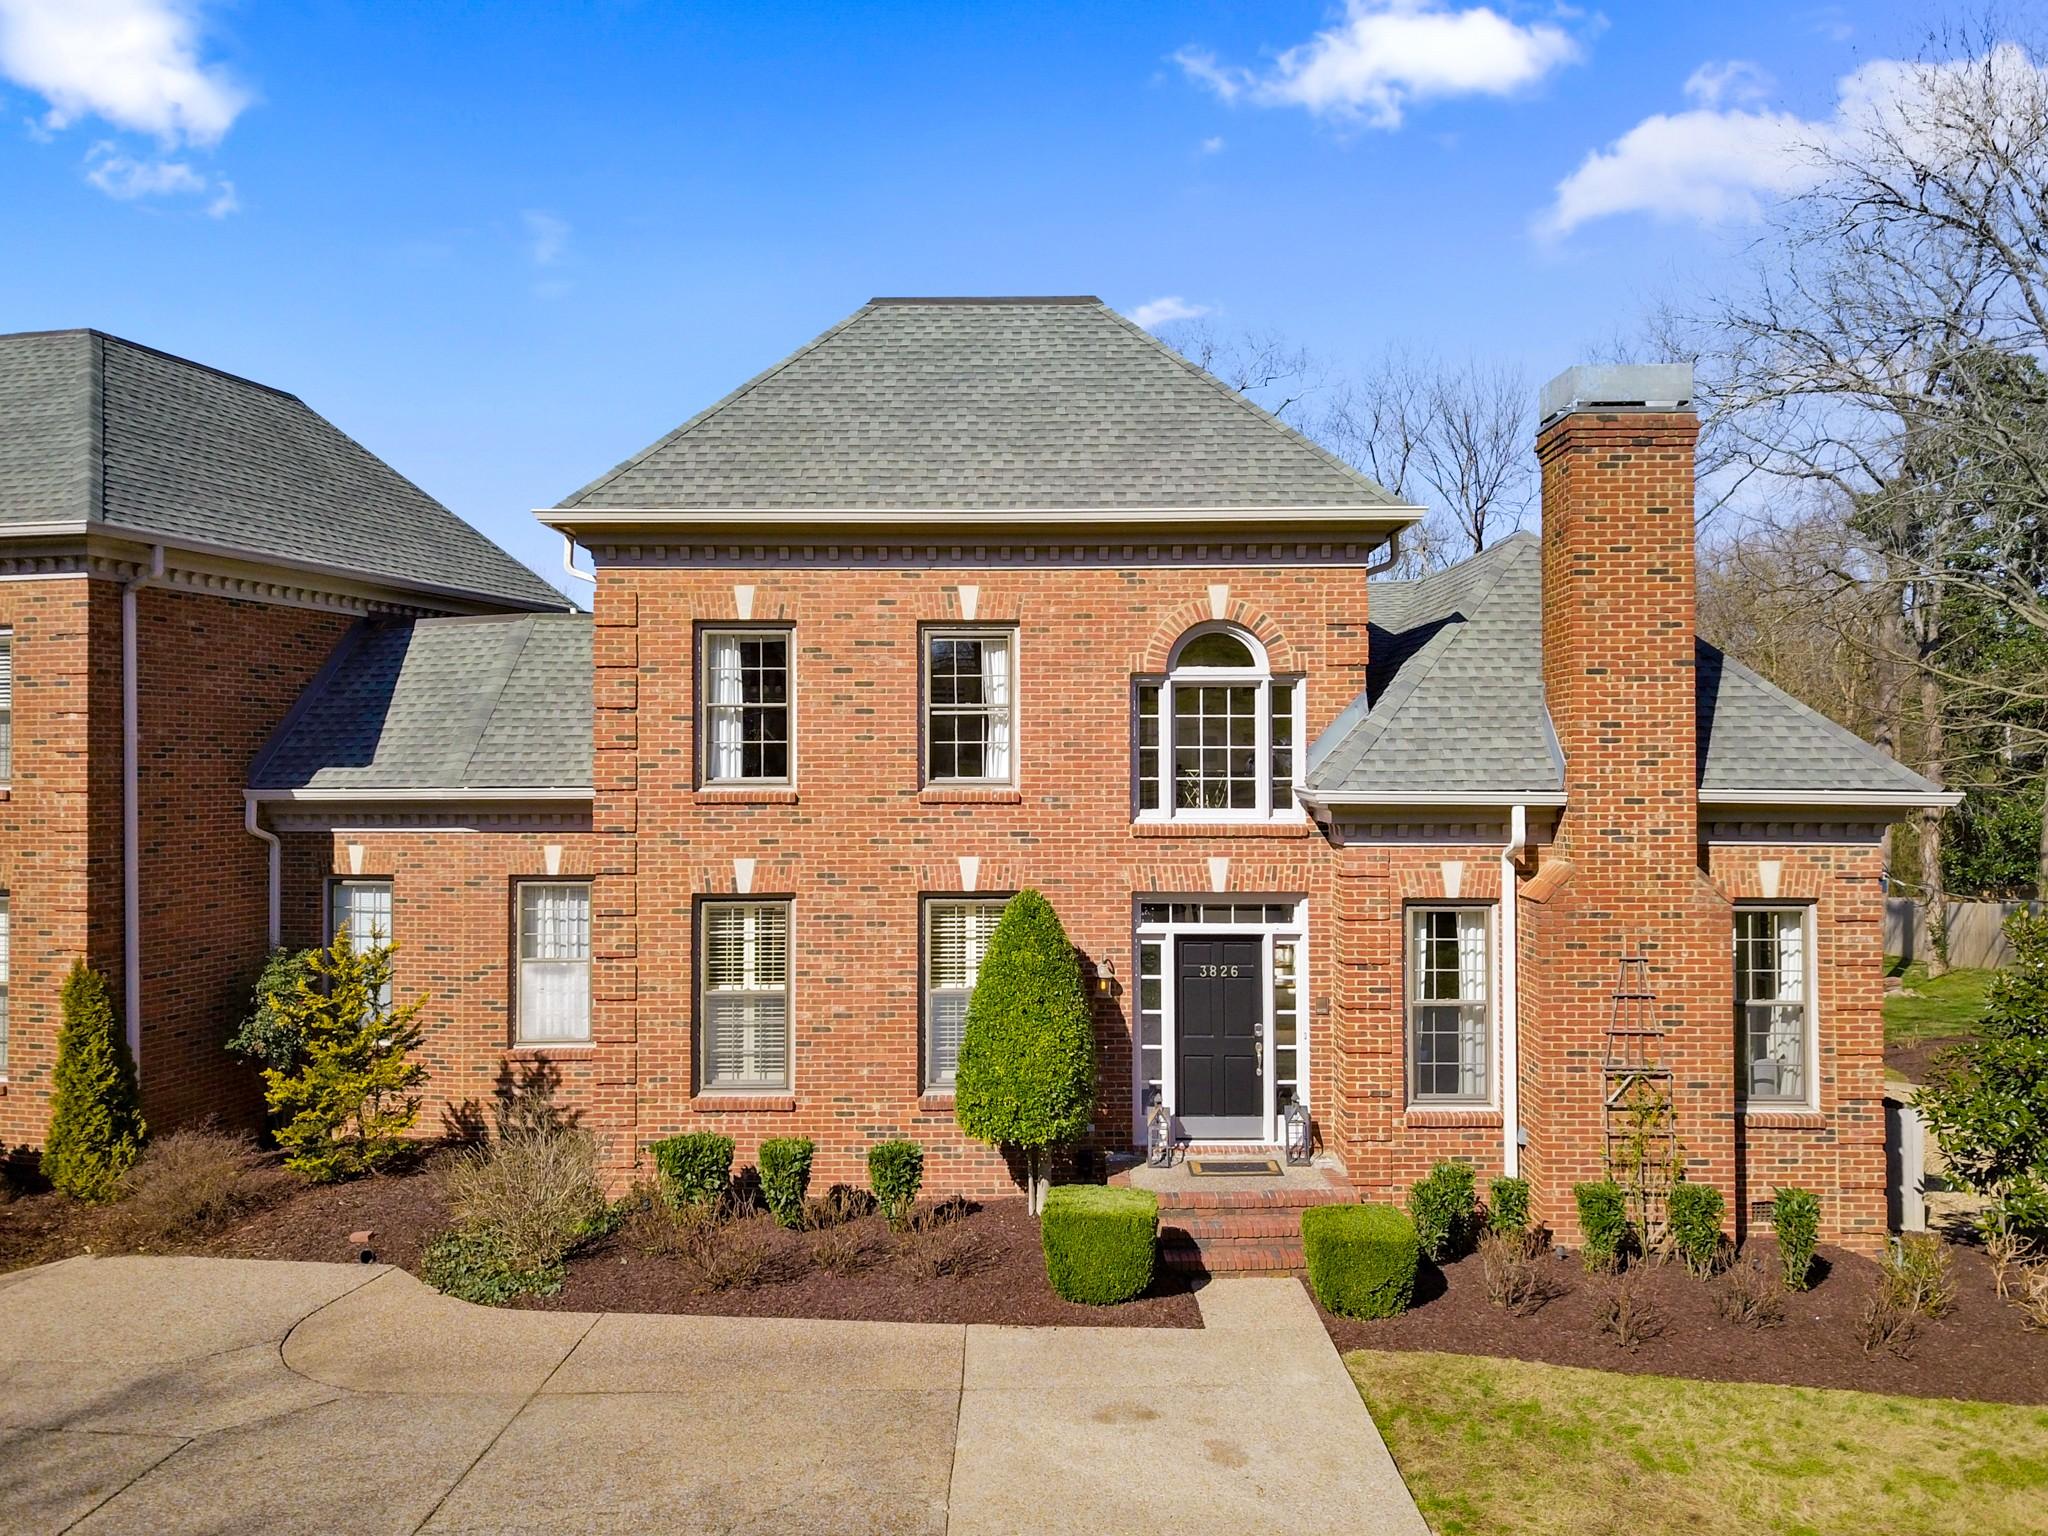 3826 Abbott Martin Rd, Nashville, TN 37215 - Nashville, TN real estate listing